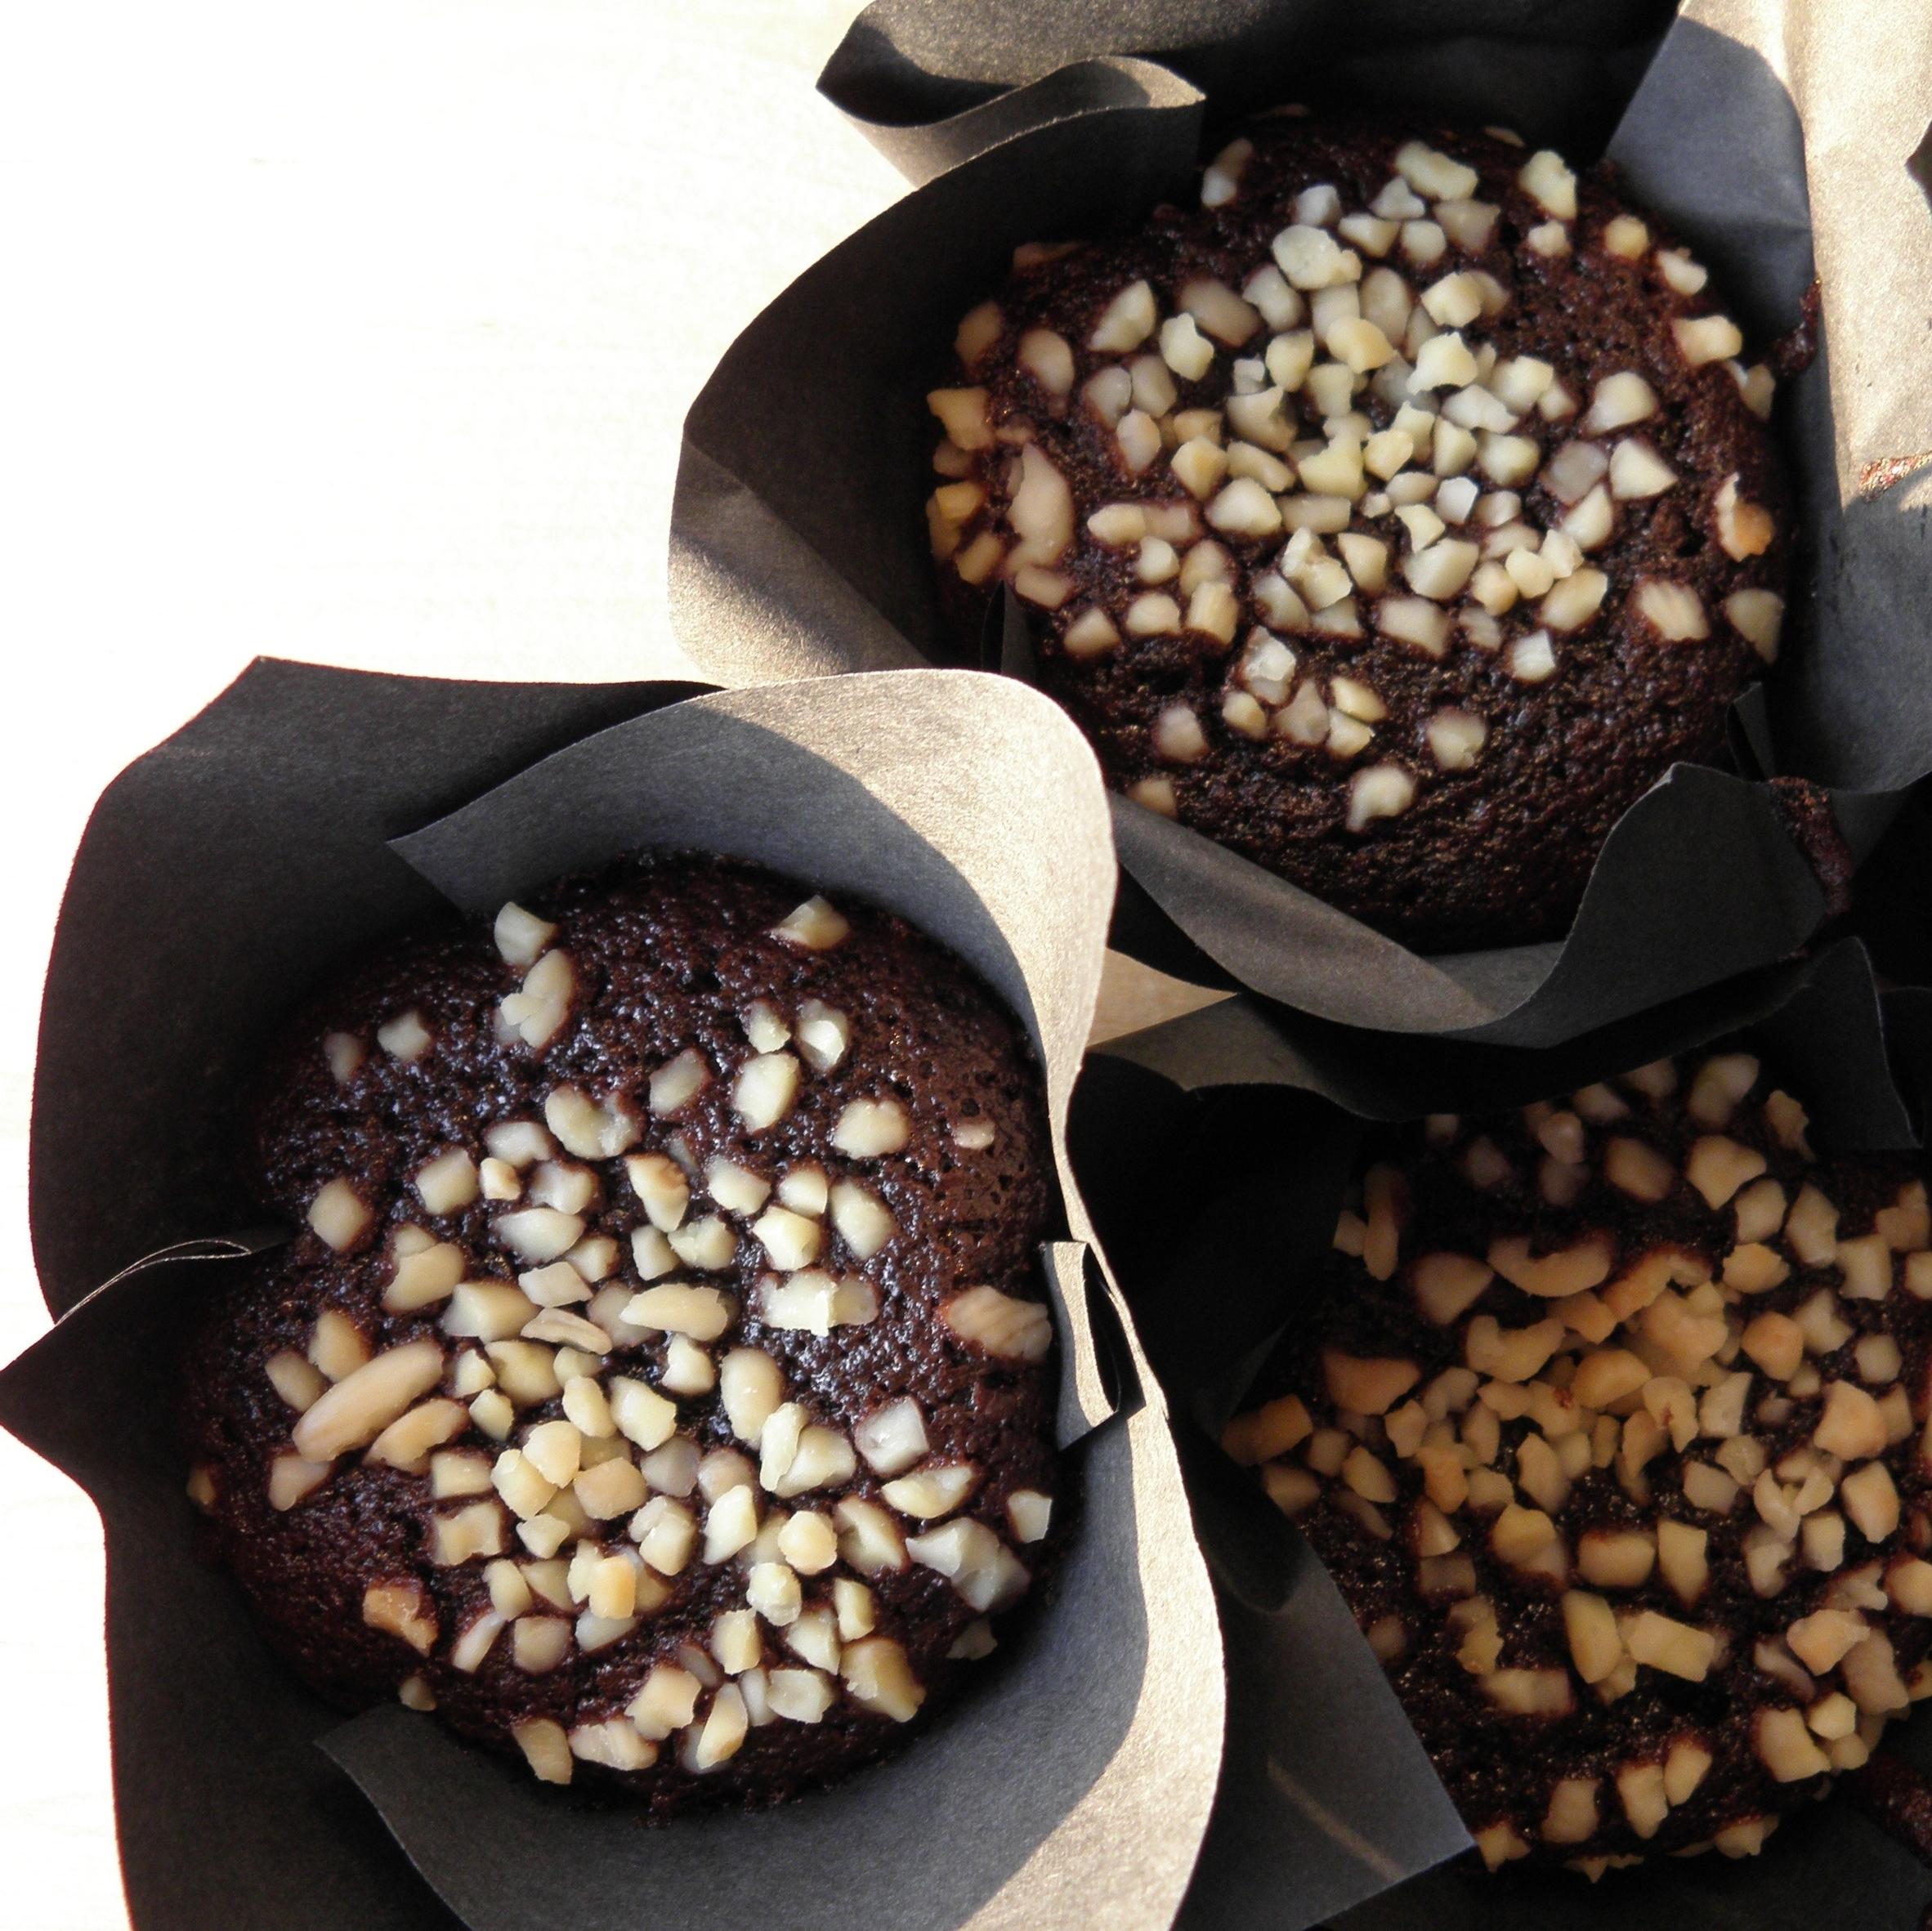 Black cherry and chocolate egg cakes